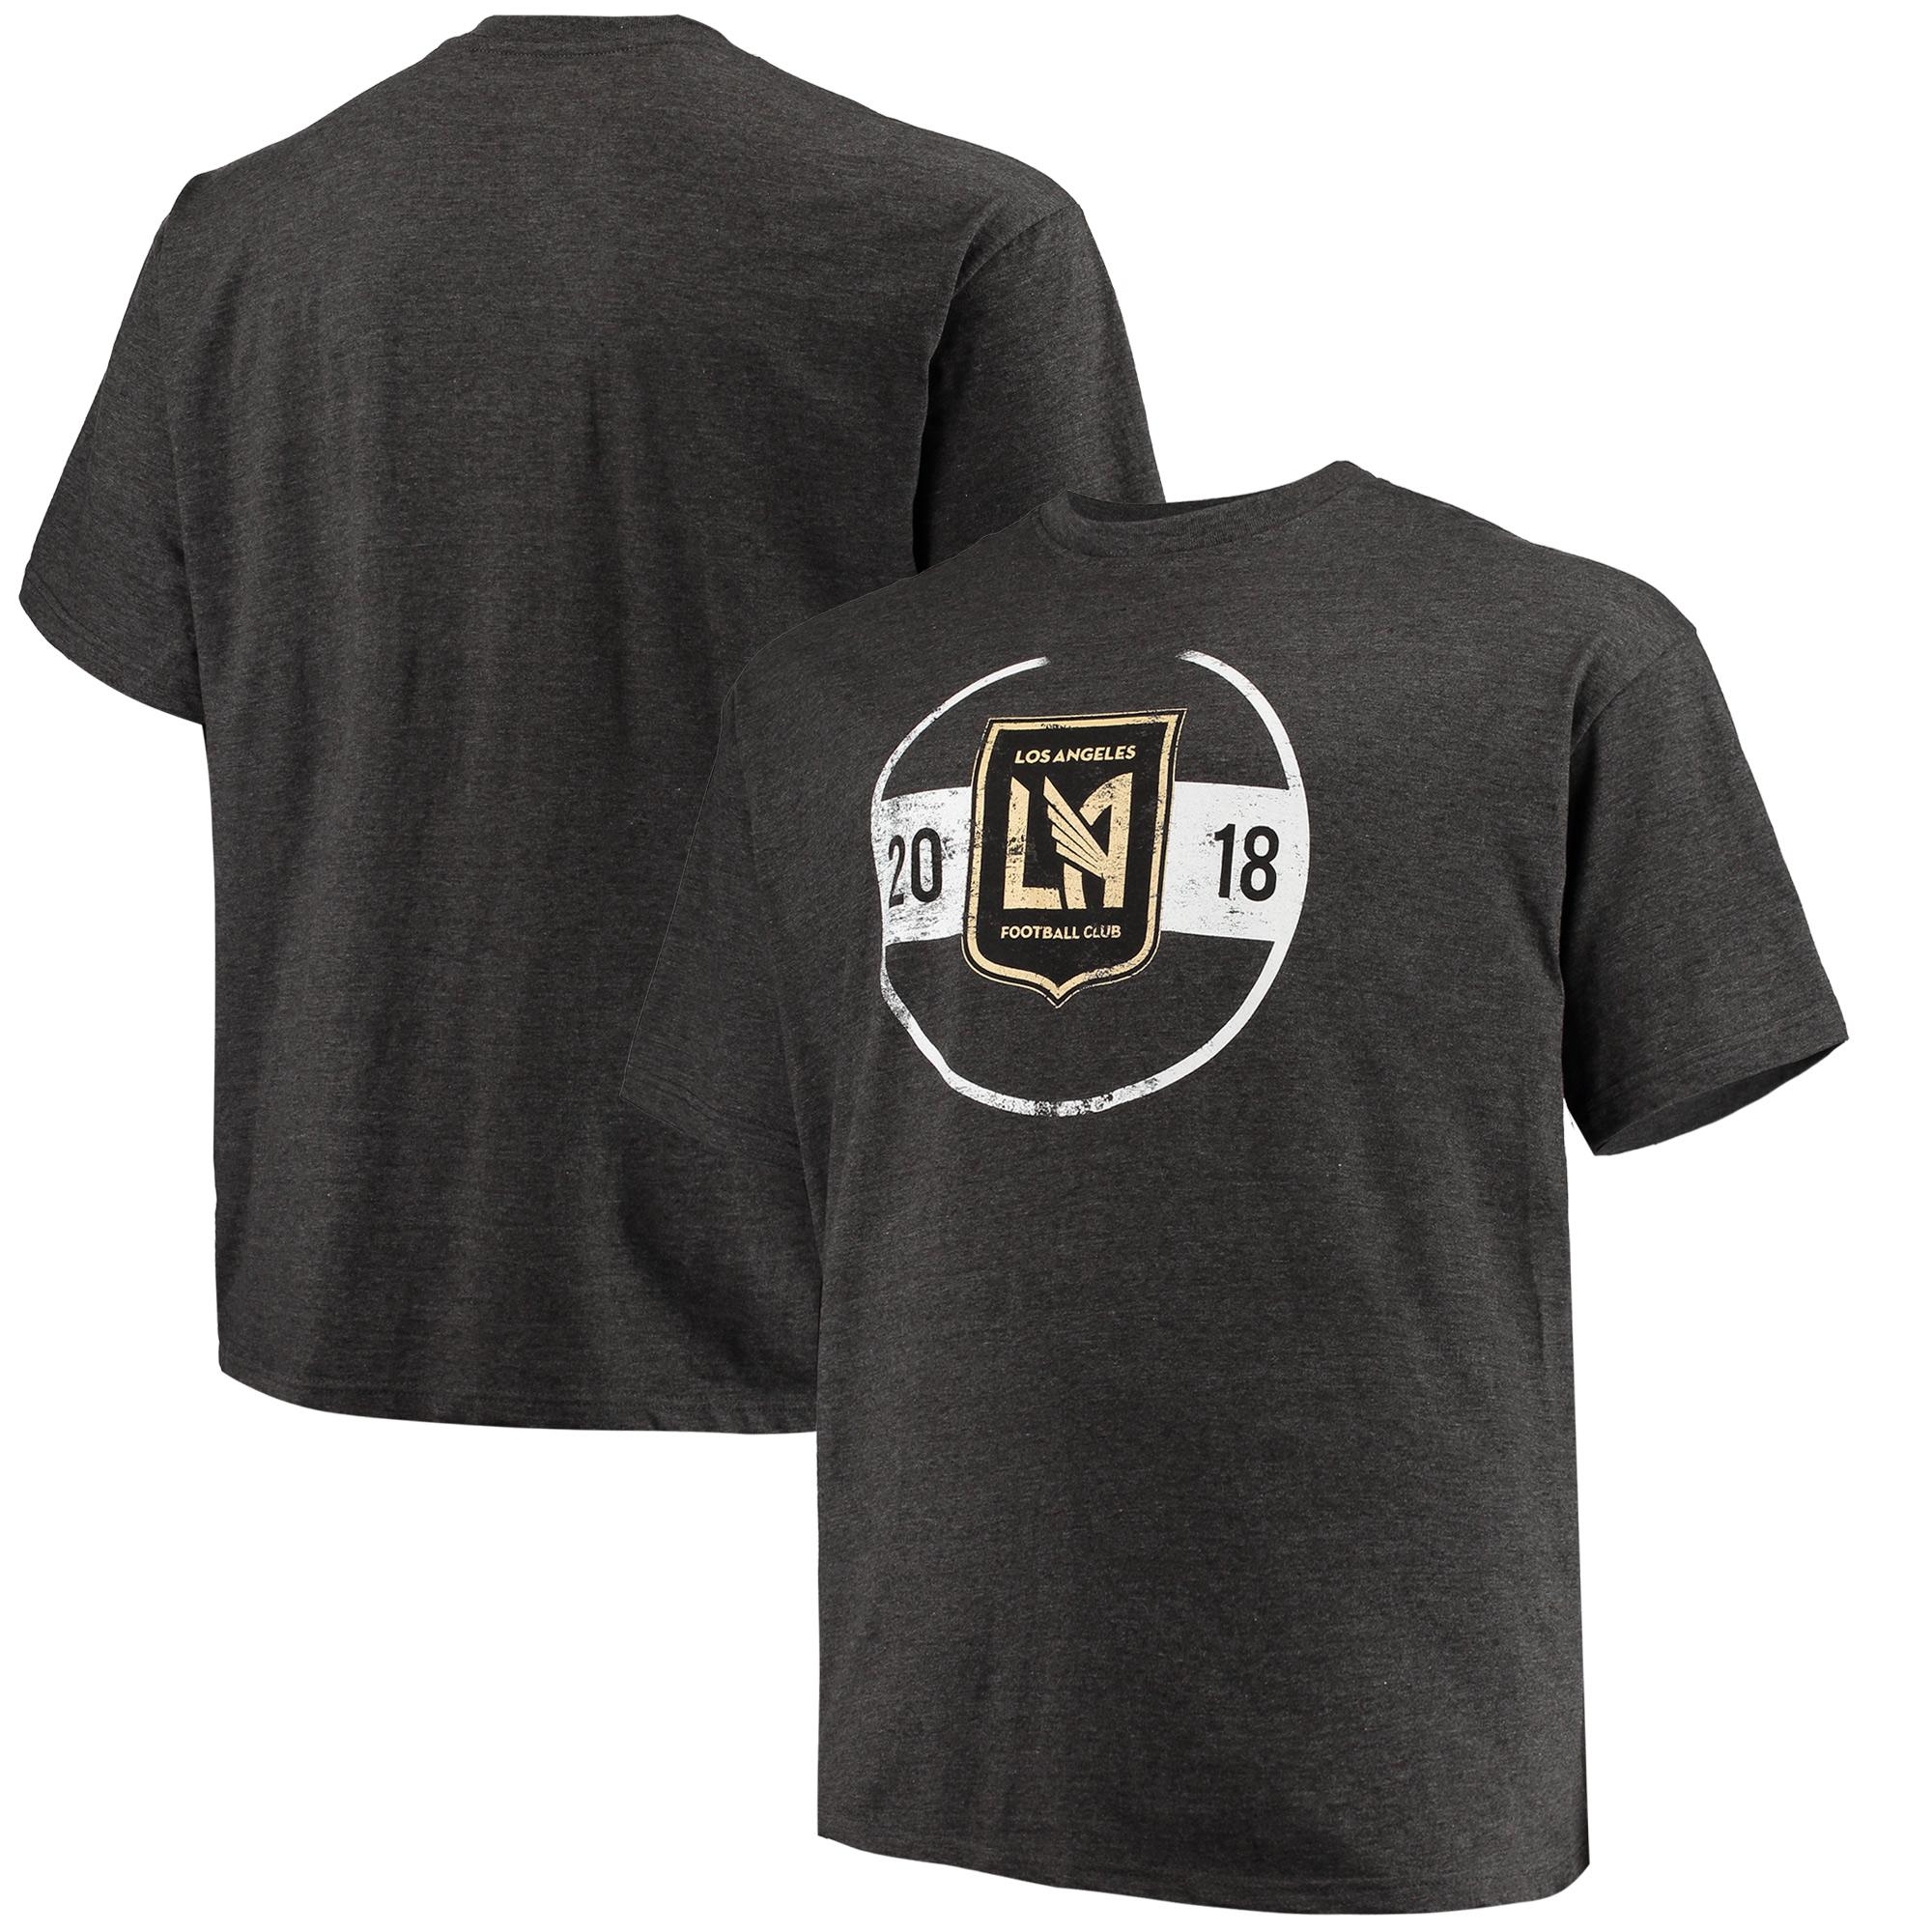 LAFC Majestic Big & Tall Every Minute T-Shirt - Charcoal